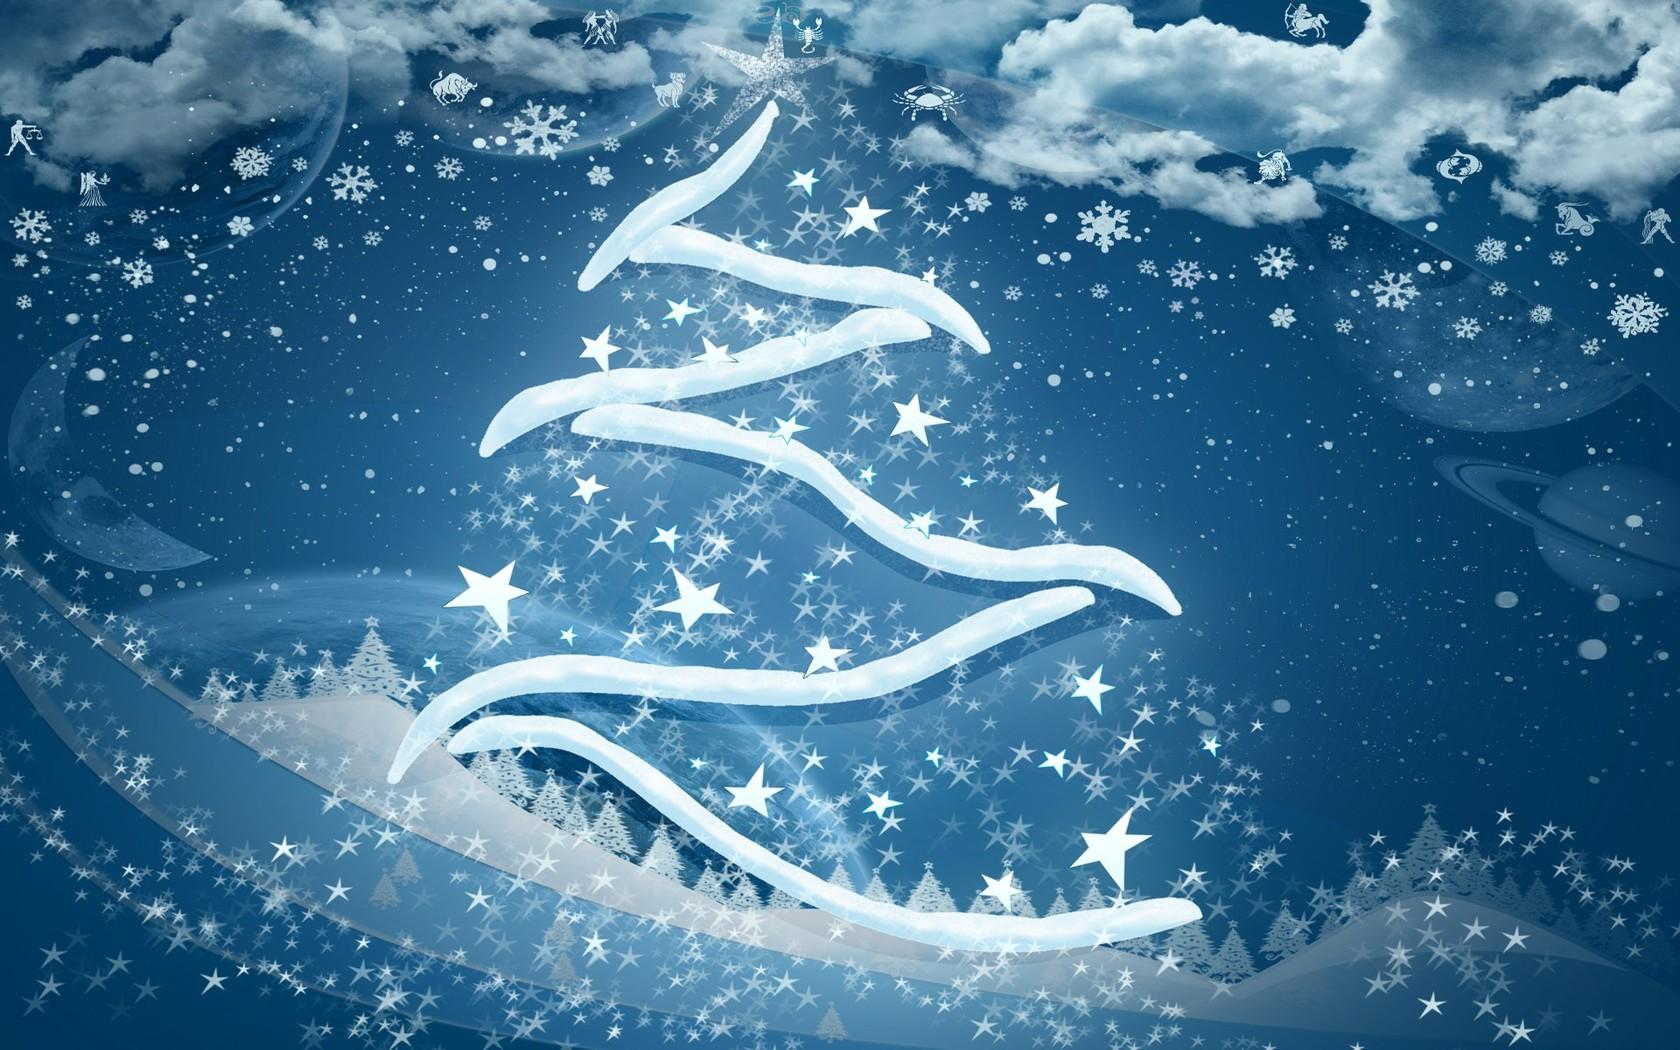 Download Snowy Christmas tree wallpaper 1680x1050